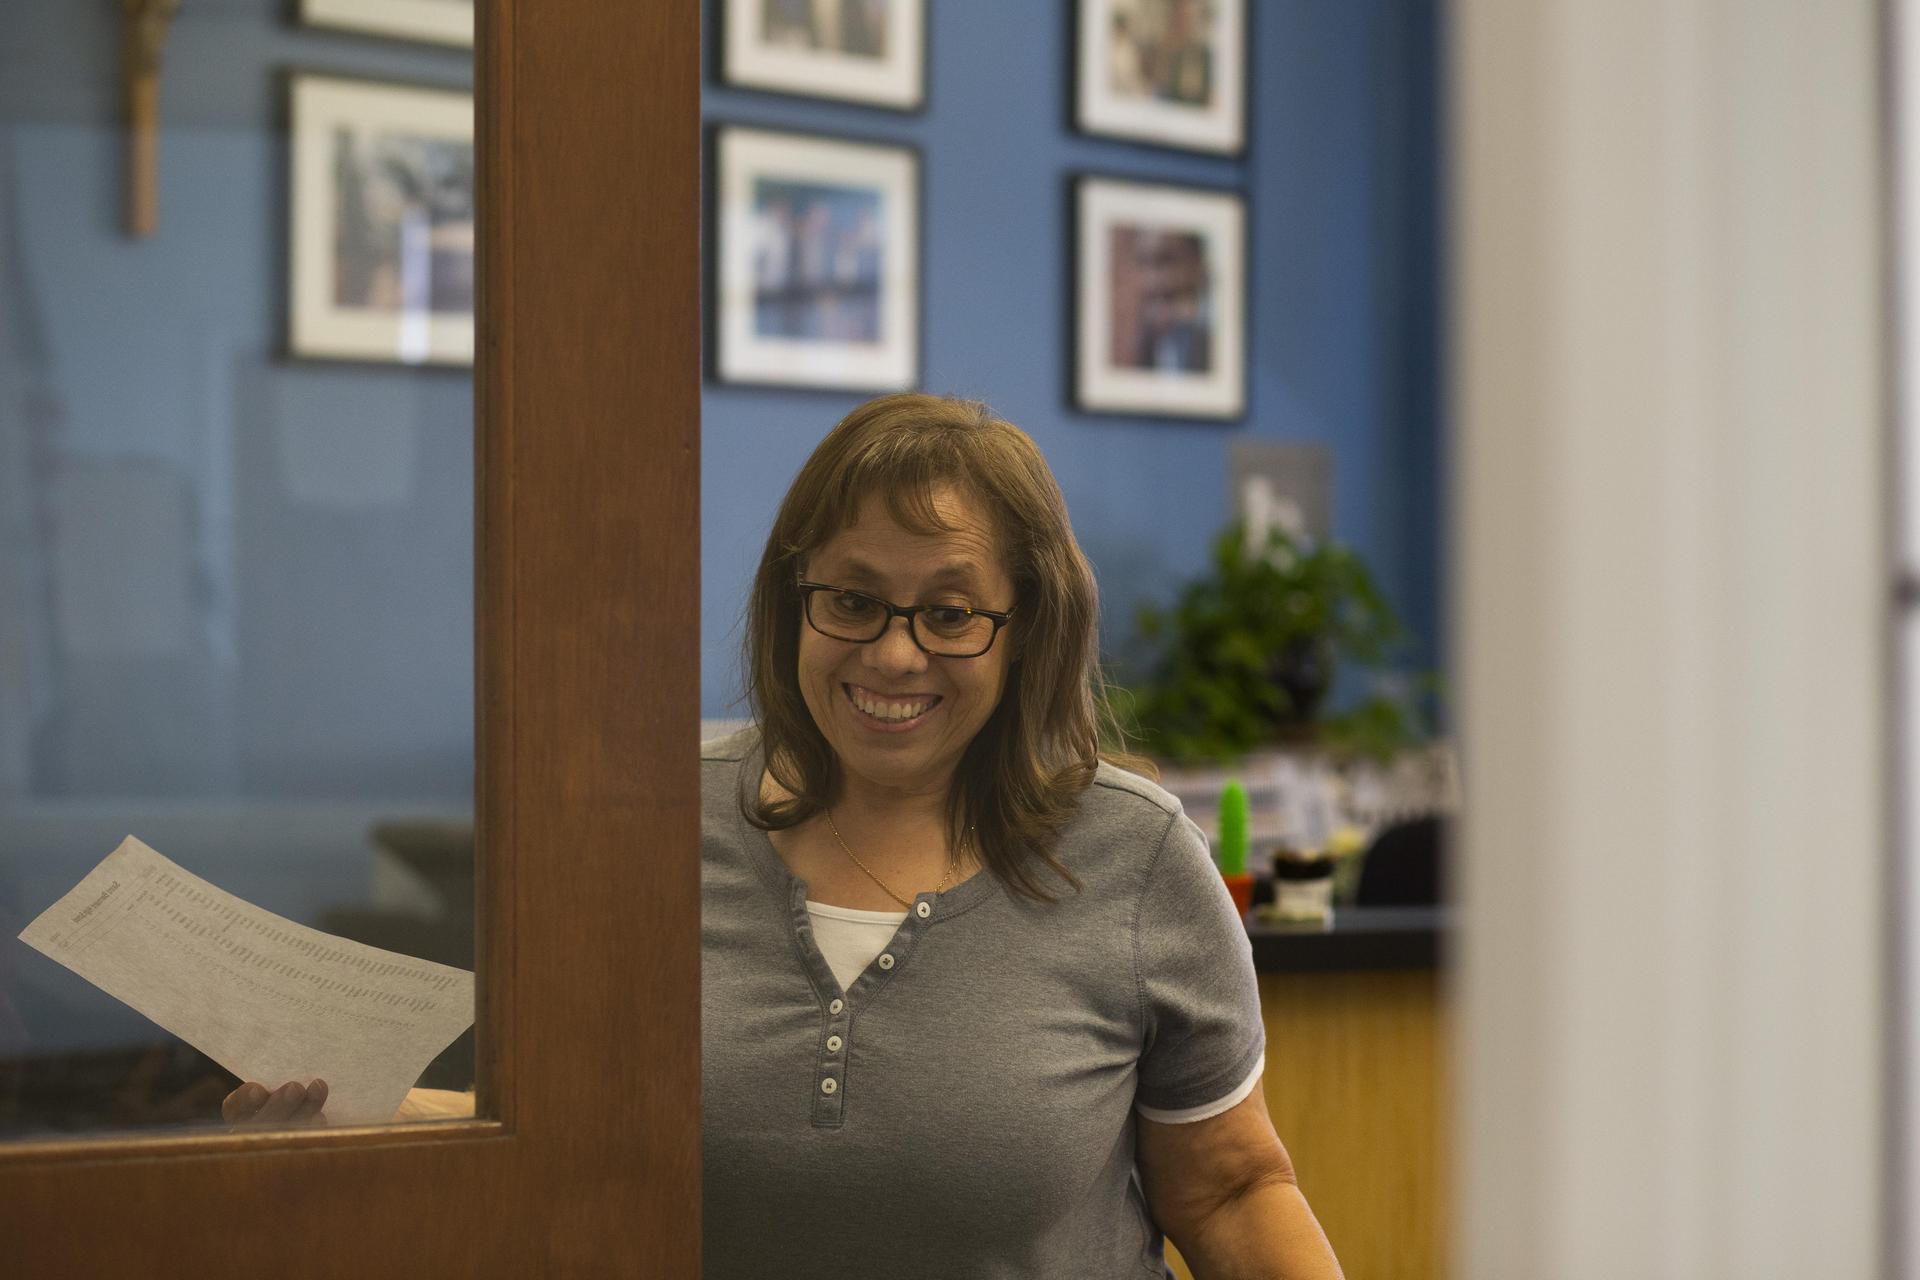 Vice Principal Rosie Roberts